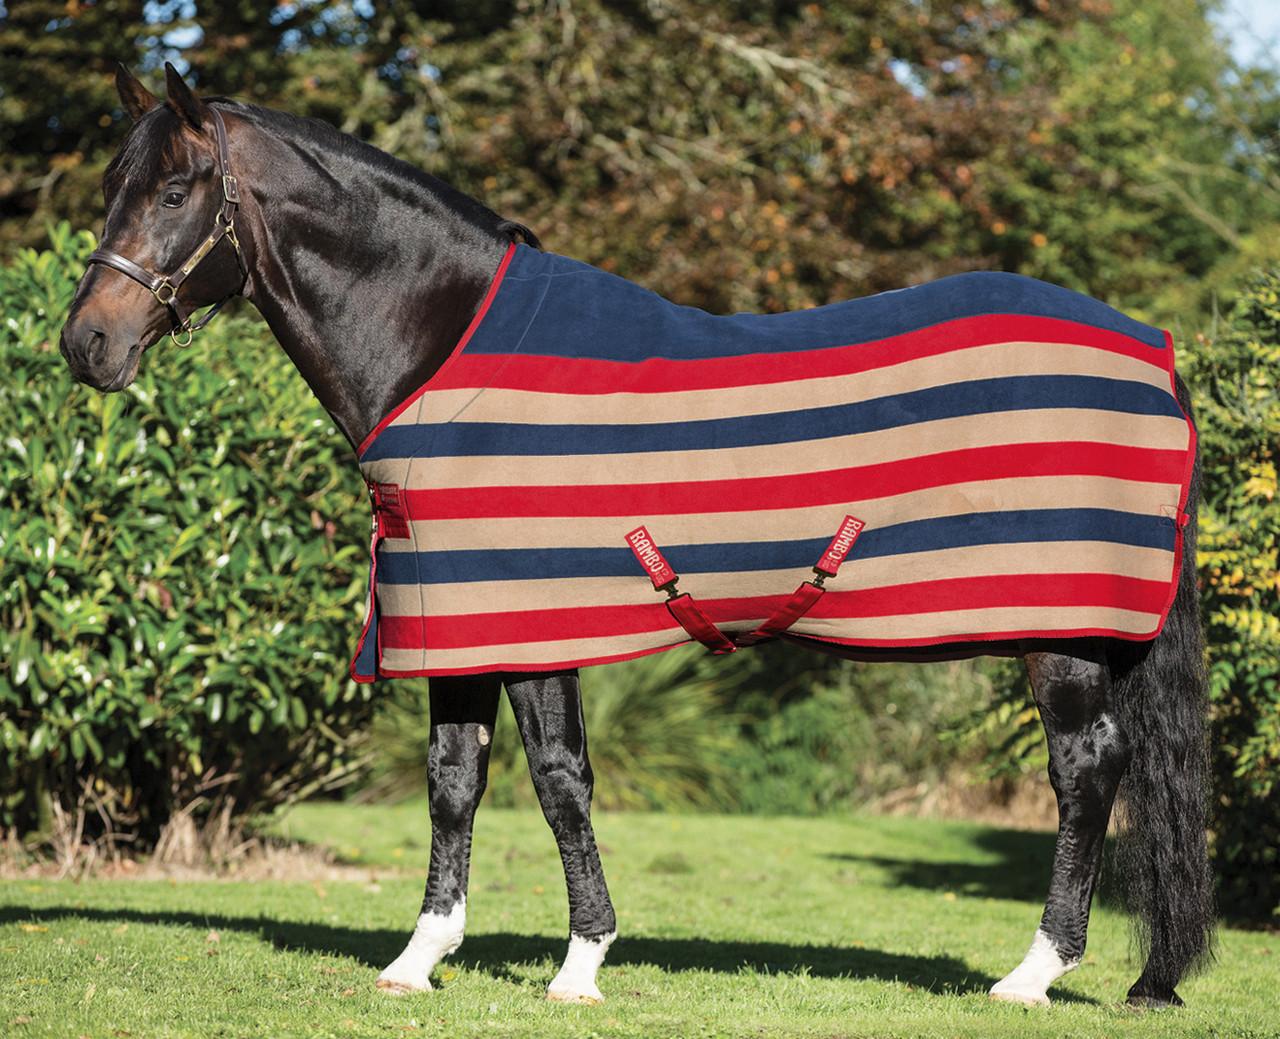 c095989622 Horseware Rambo Newmarket Fleece Sheet